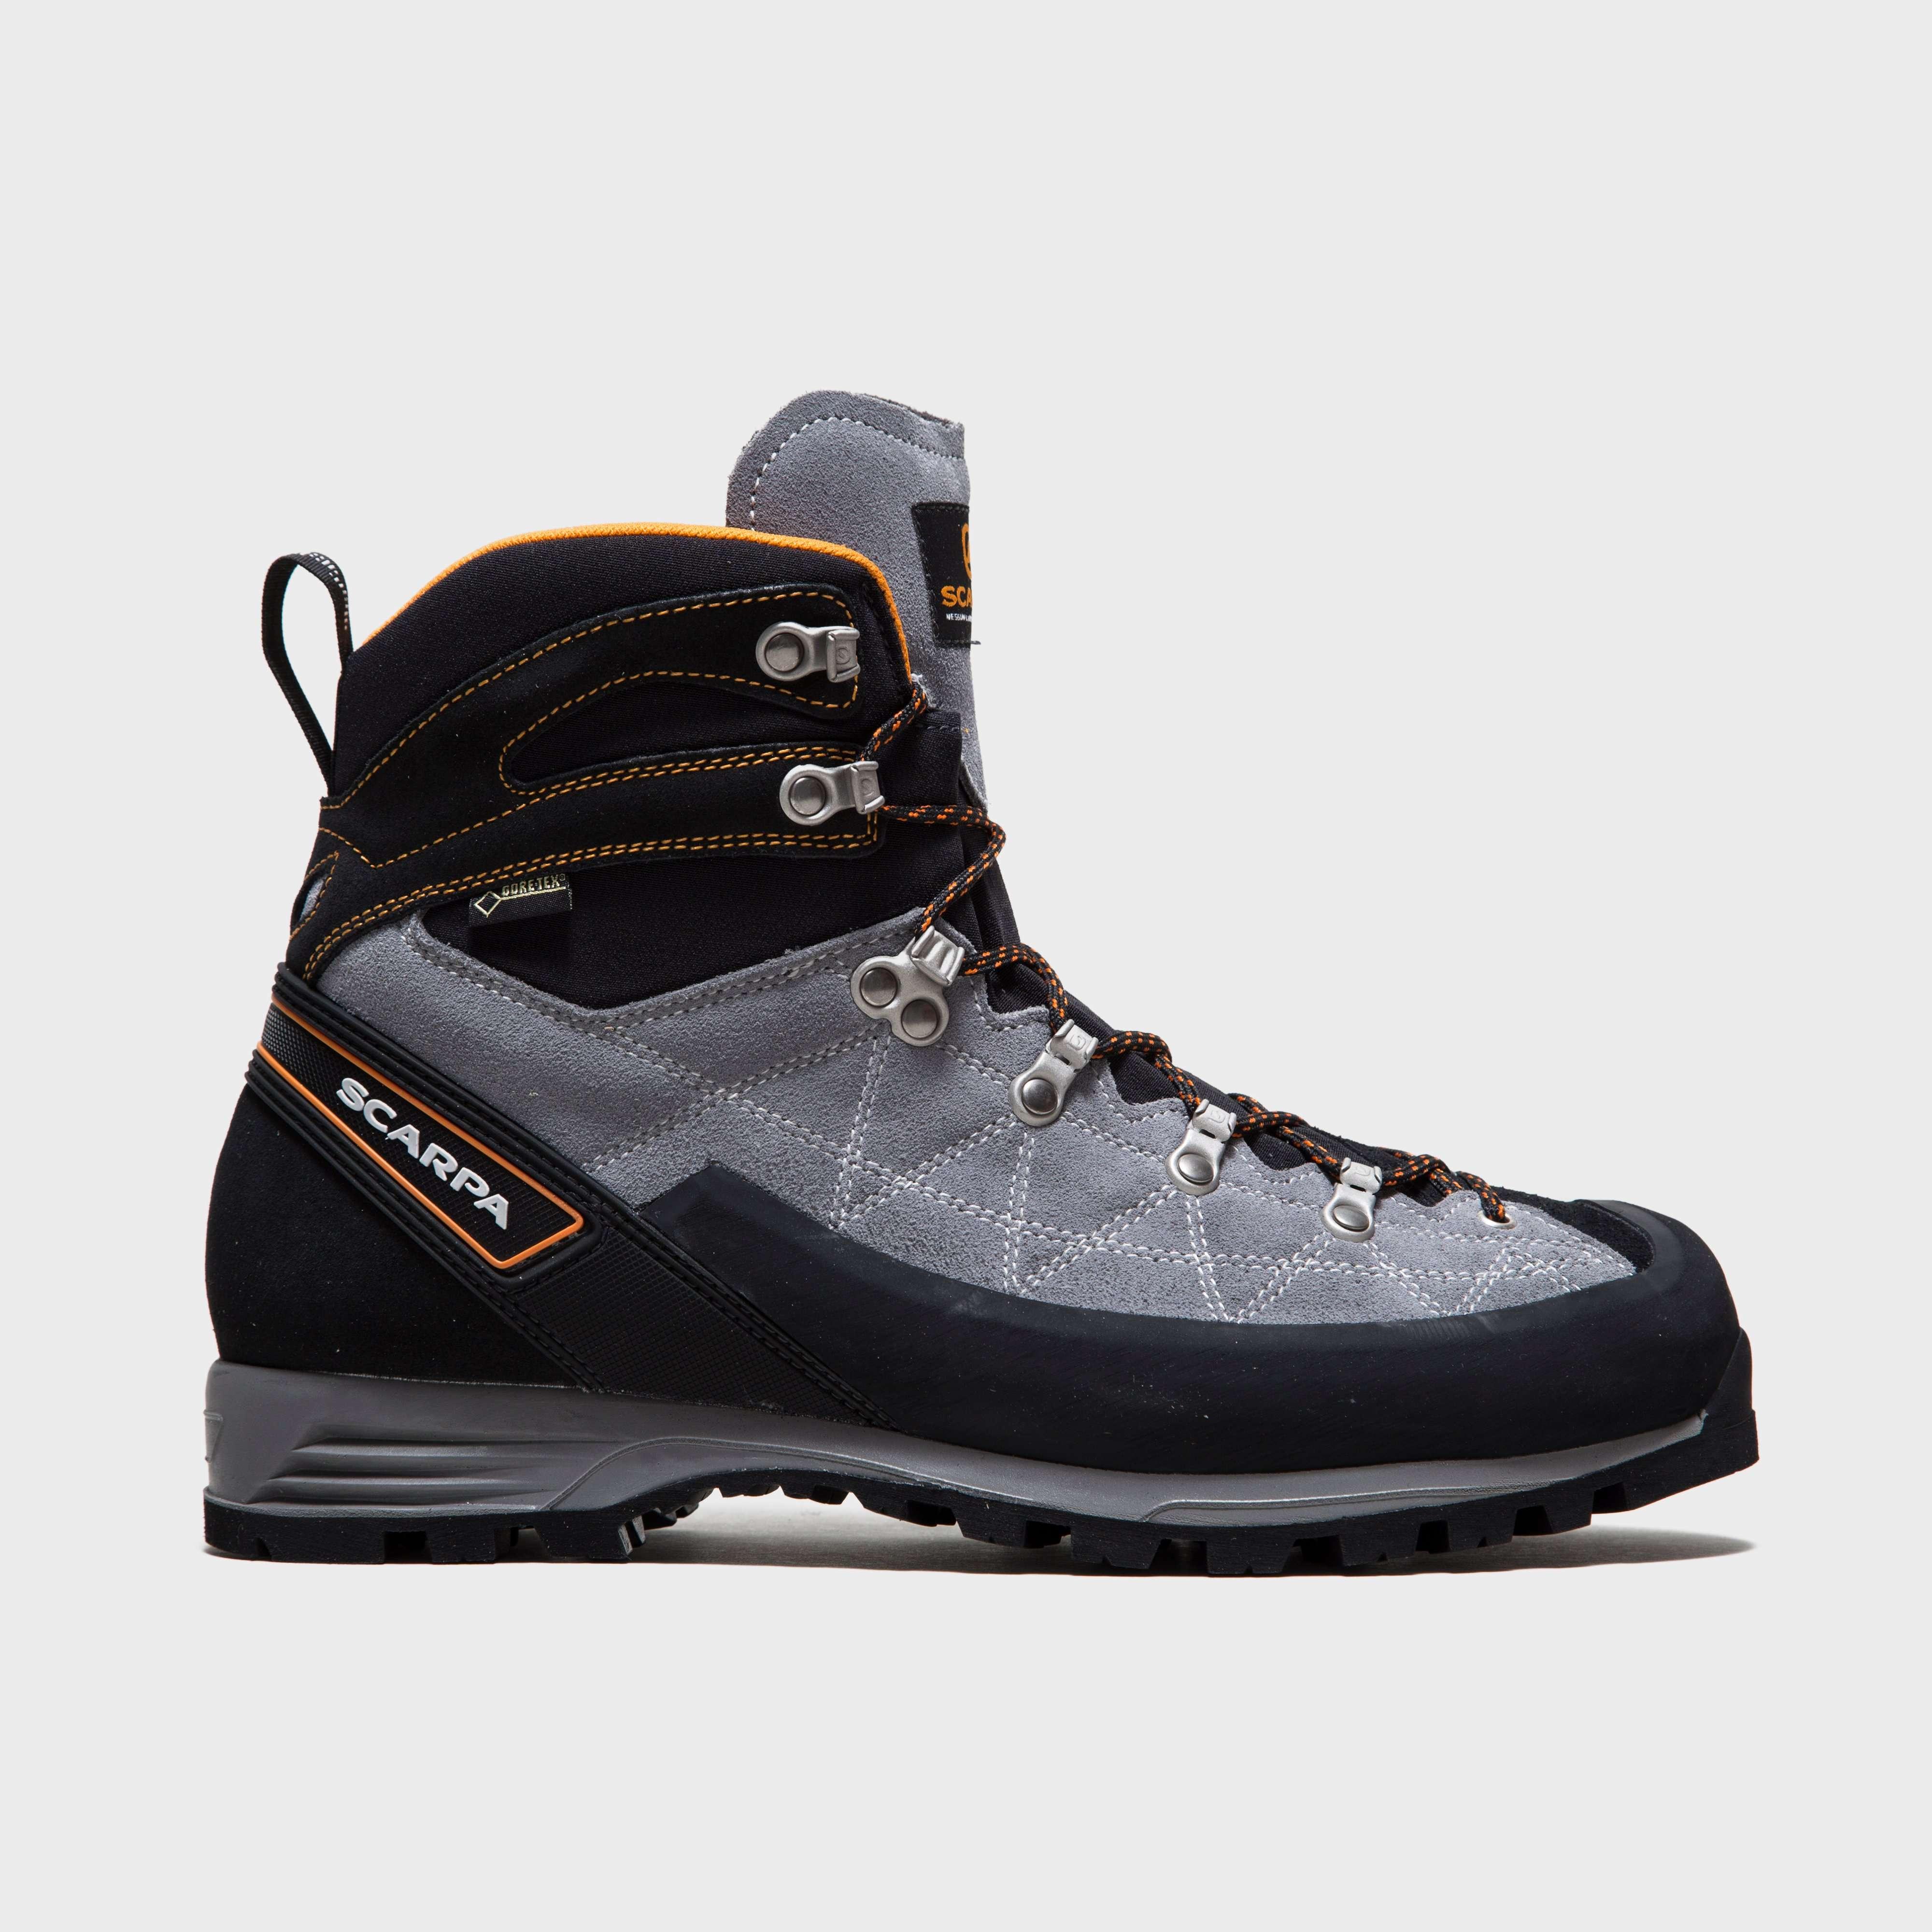 SCARPA Men's R-Evolution Pro GORE-TEX® Trekking Boot